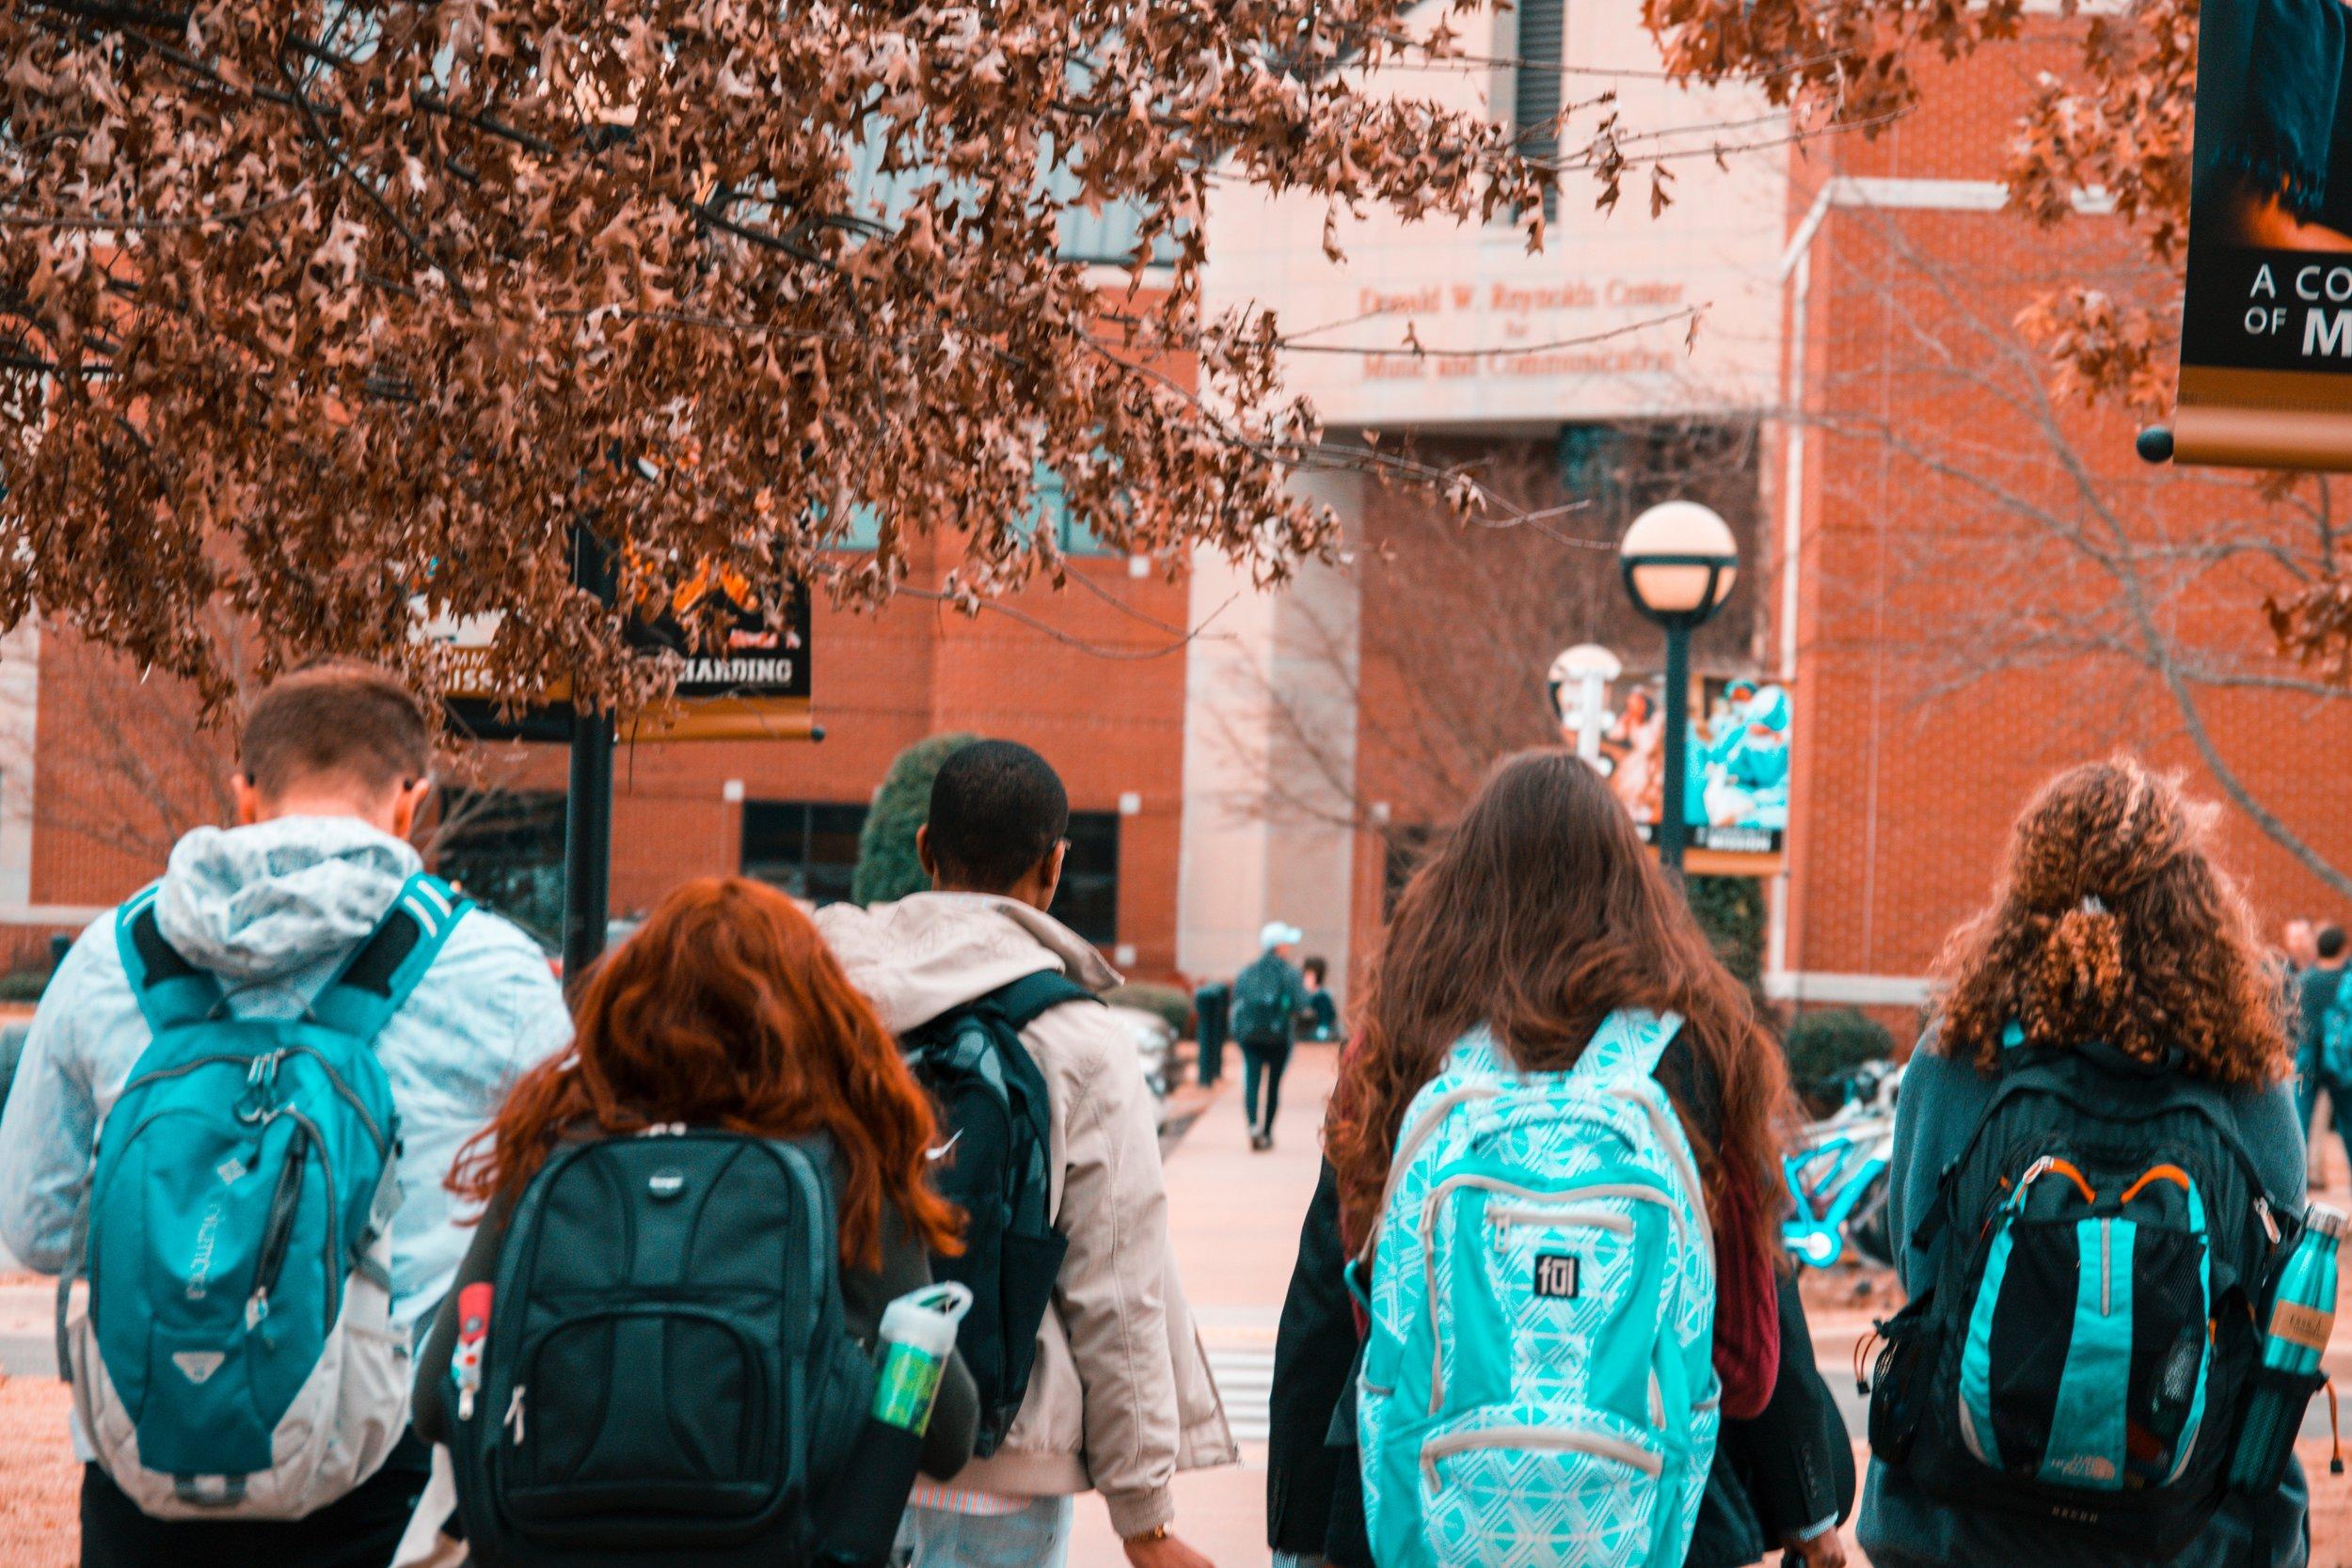 backpacks-college-college-students-1454360.jpg